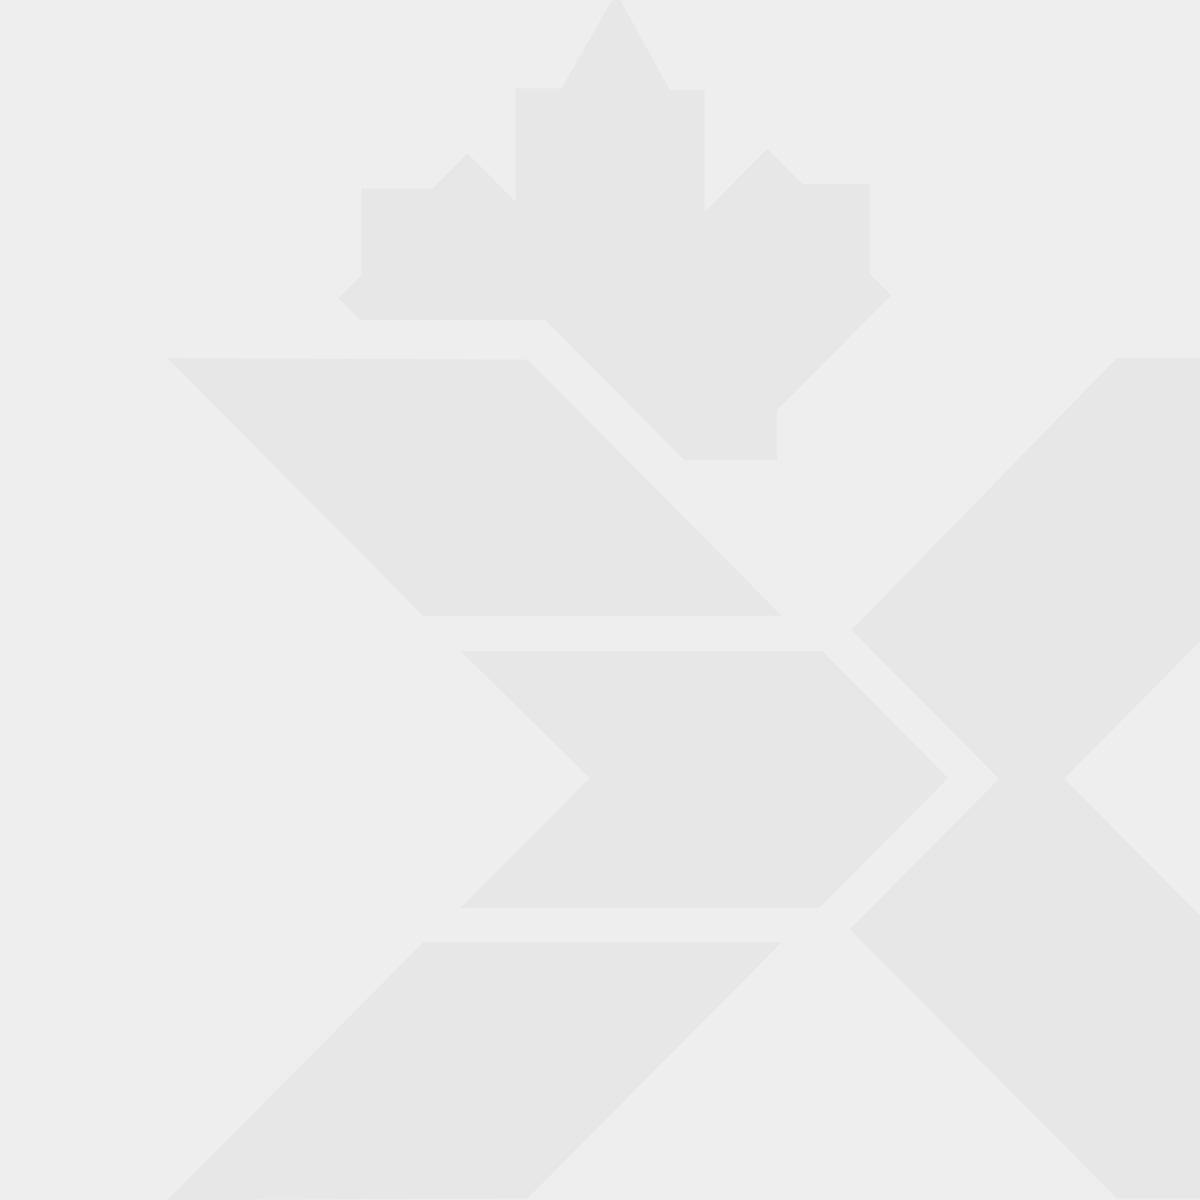 FUJIFILM Instax Mini Oh Canada! Instant Film (600018172)